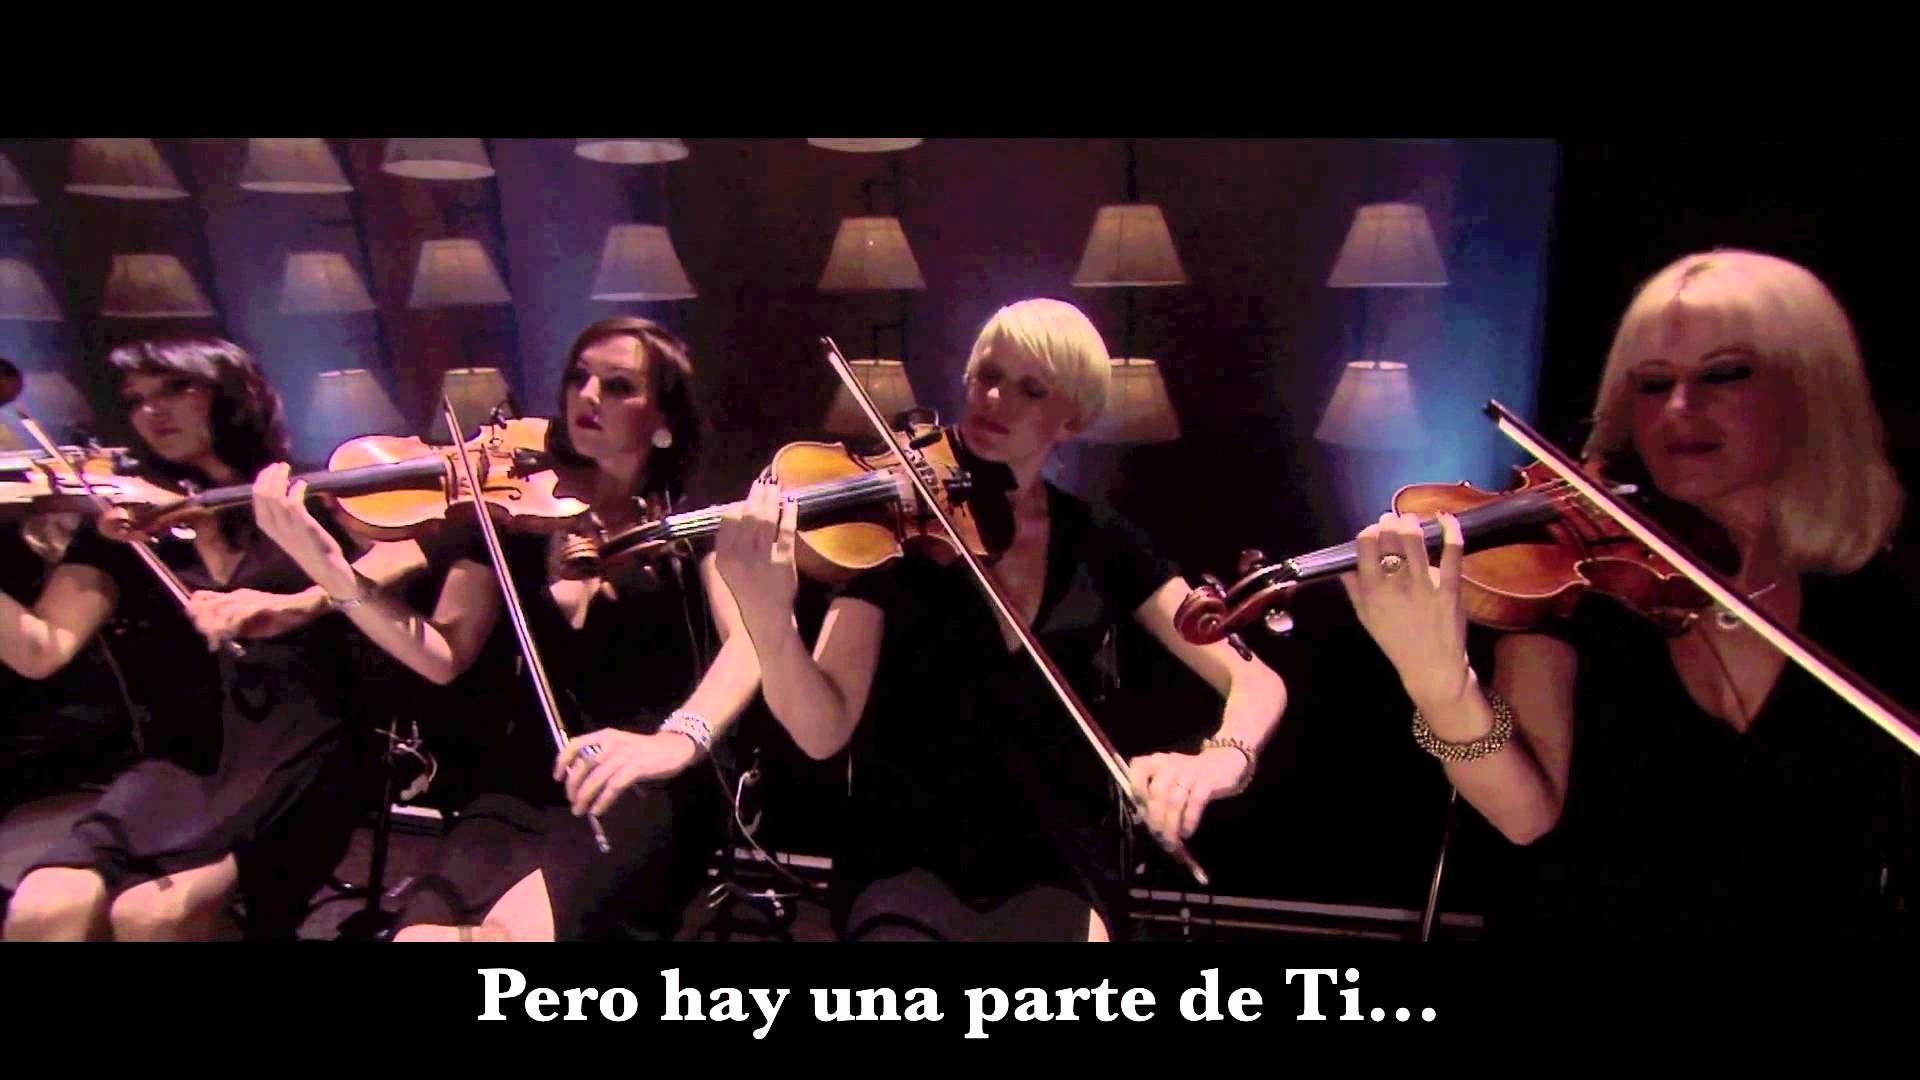 Adele Set Fire To The Rain Youtube Subtitulada En Espanol